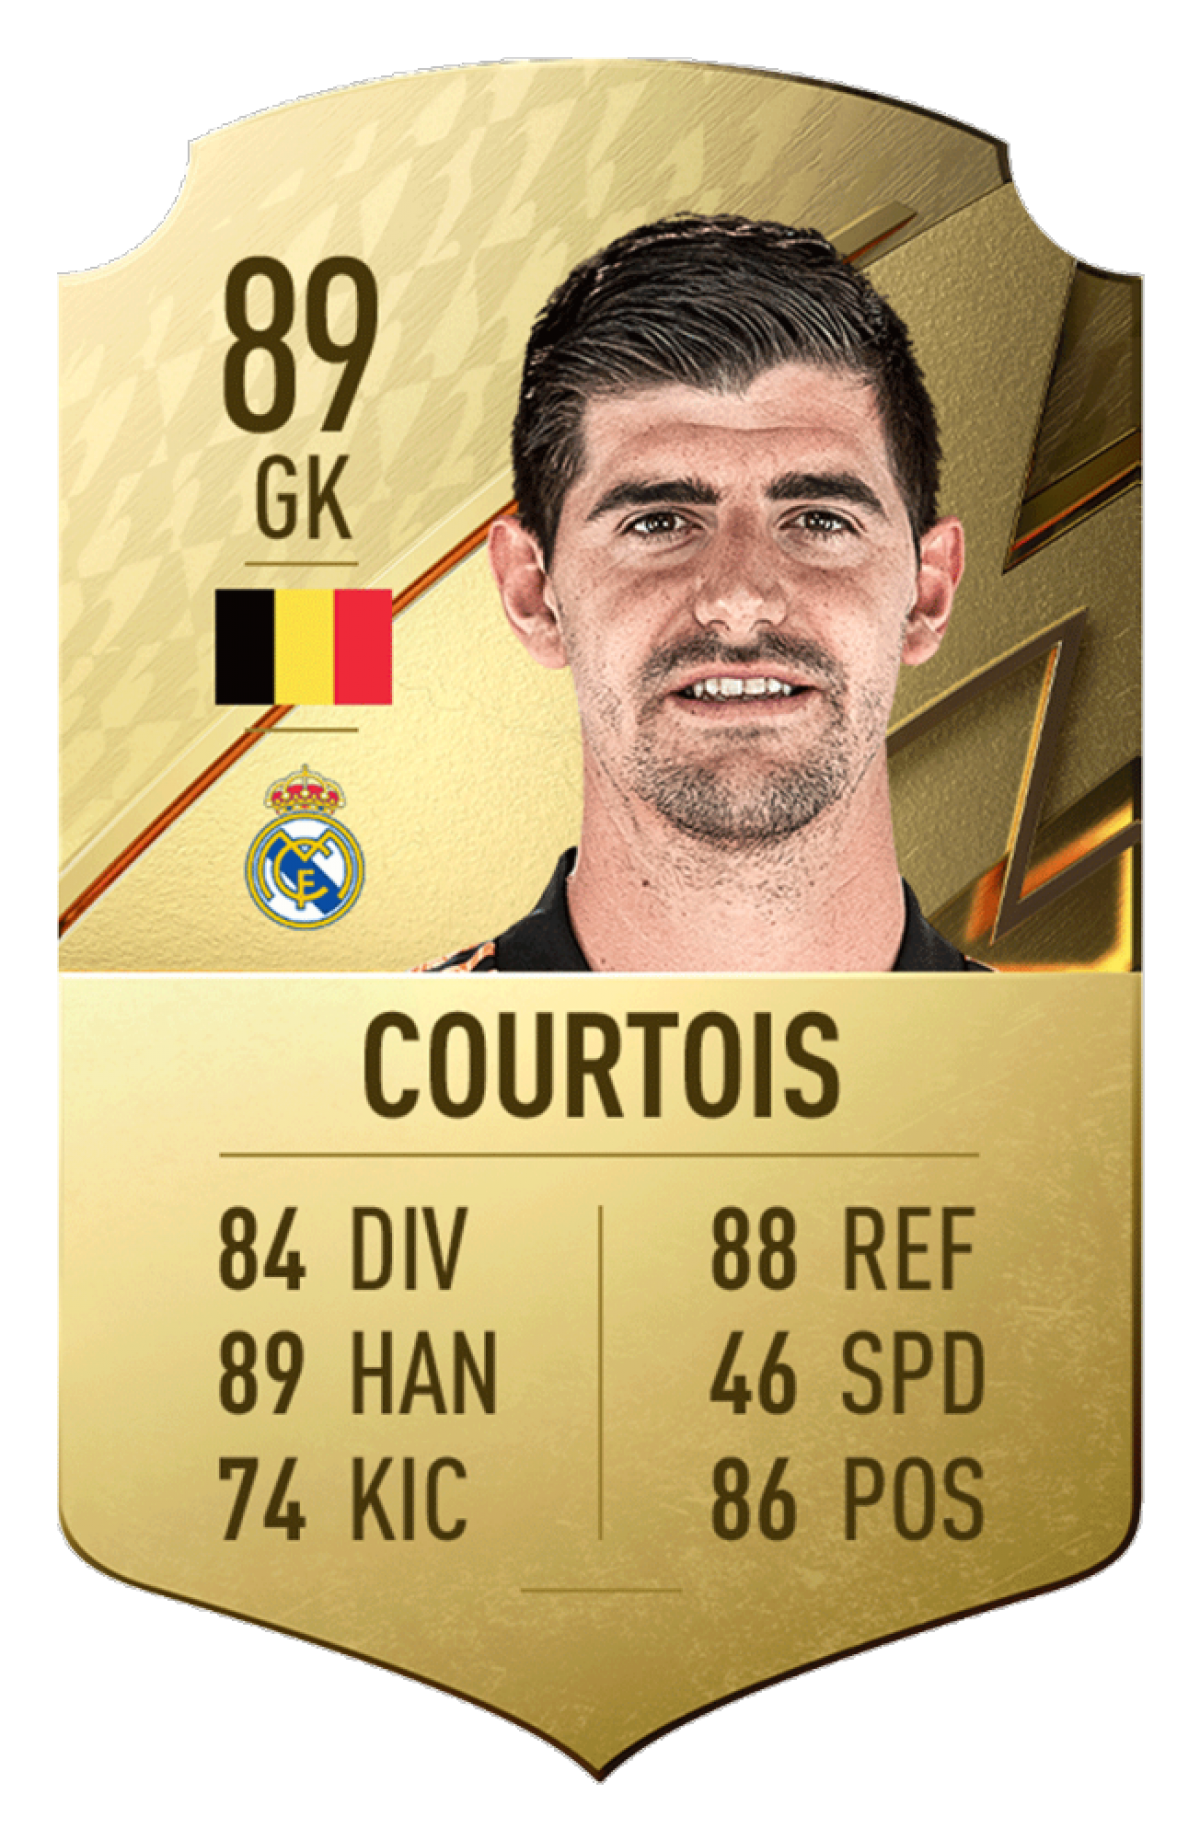 4. Thibaut Courtois | Real Madrid | Chỉ số tổng quan: 89